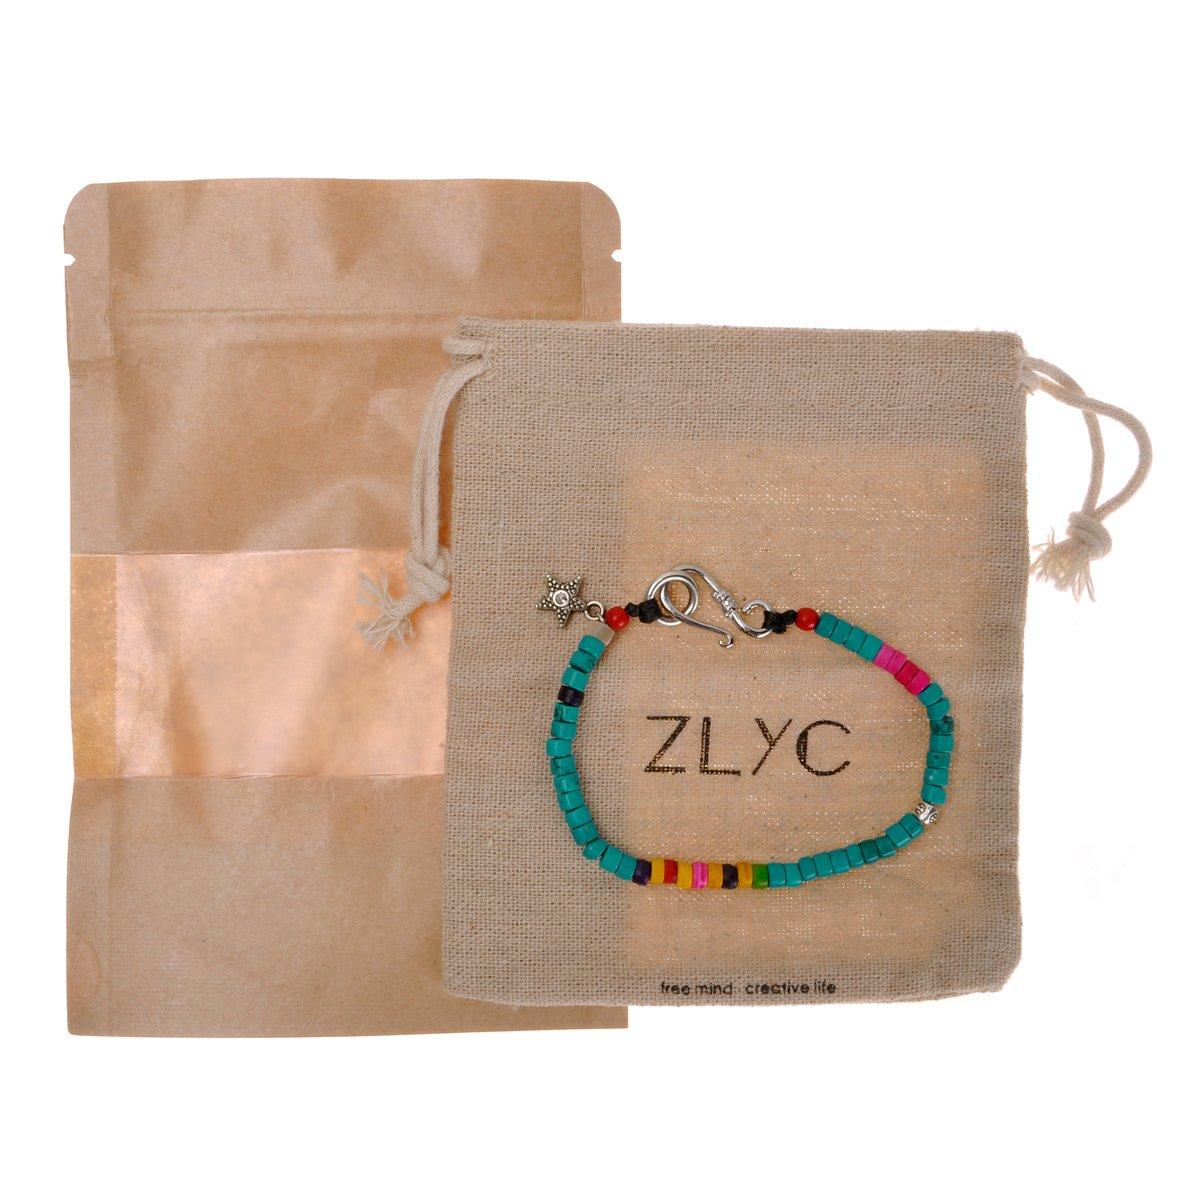 ZLYC Women Handmade Multi-Tone Turquoise Bead Wrap Bracelet with Seastar Closure ZYJ-SL-038-TU